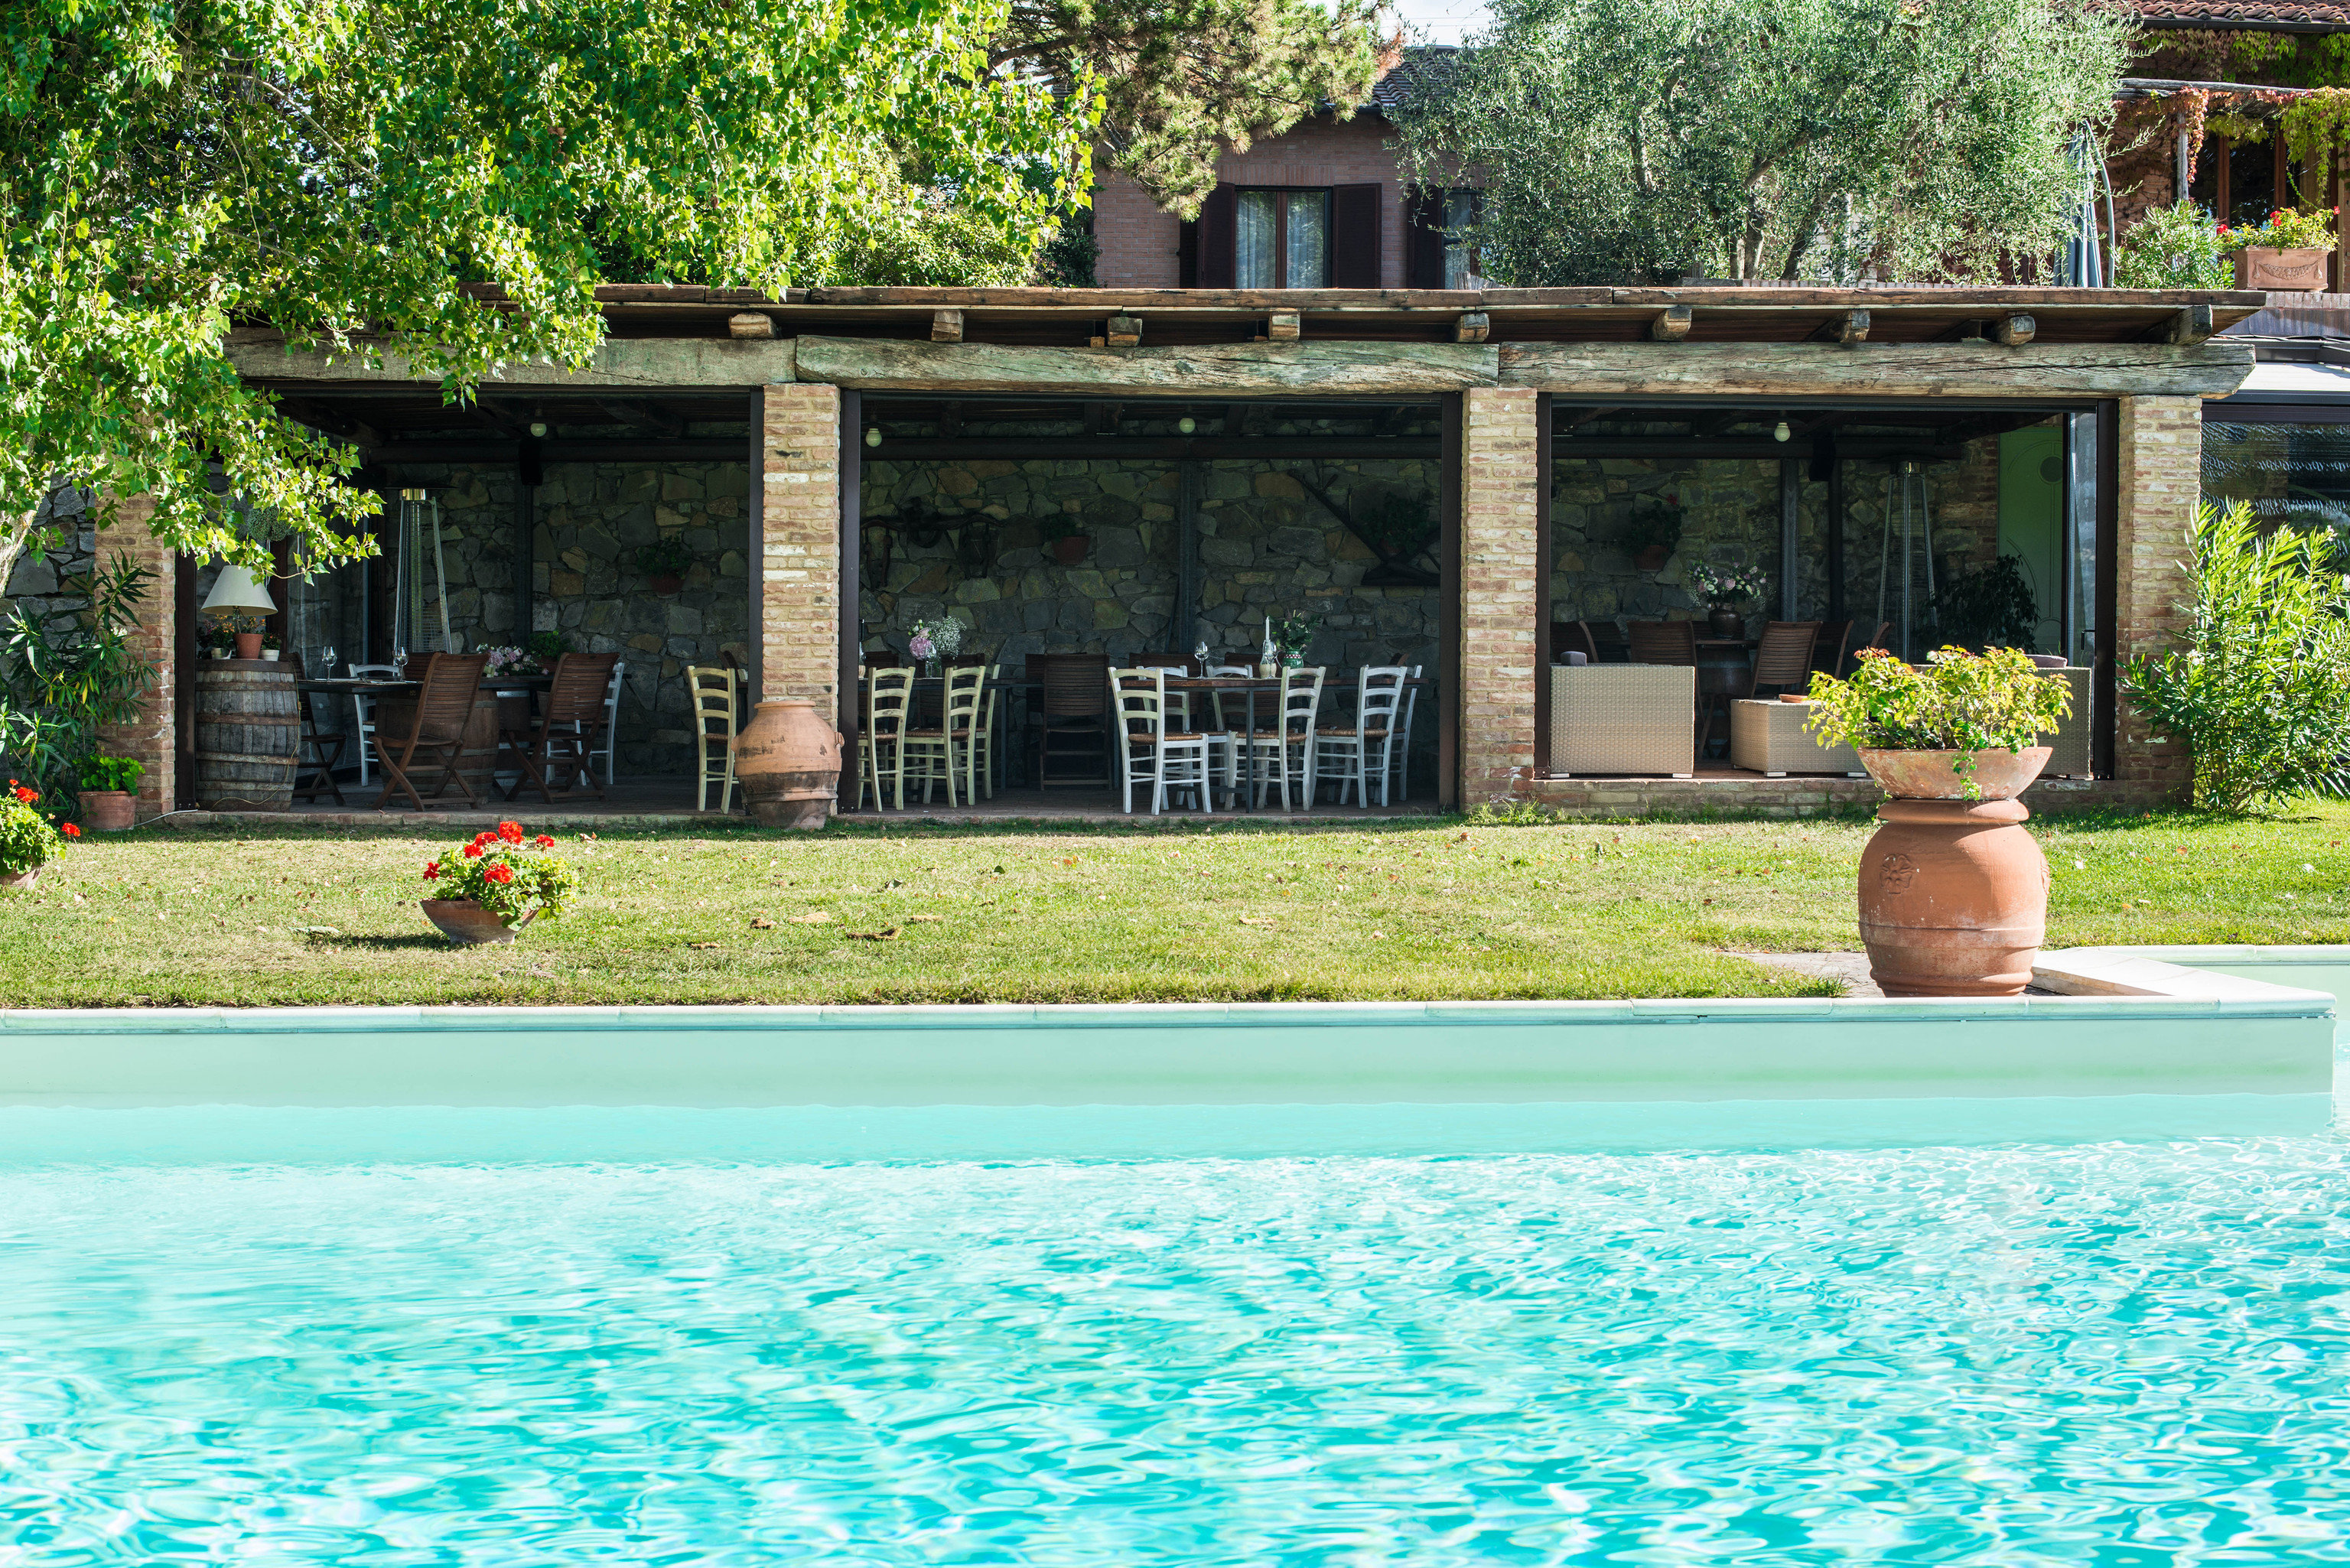 tree swimming pool property house Pool home backyard Villa Resort cottage mansion swimming